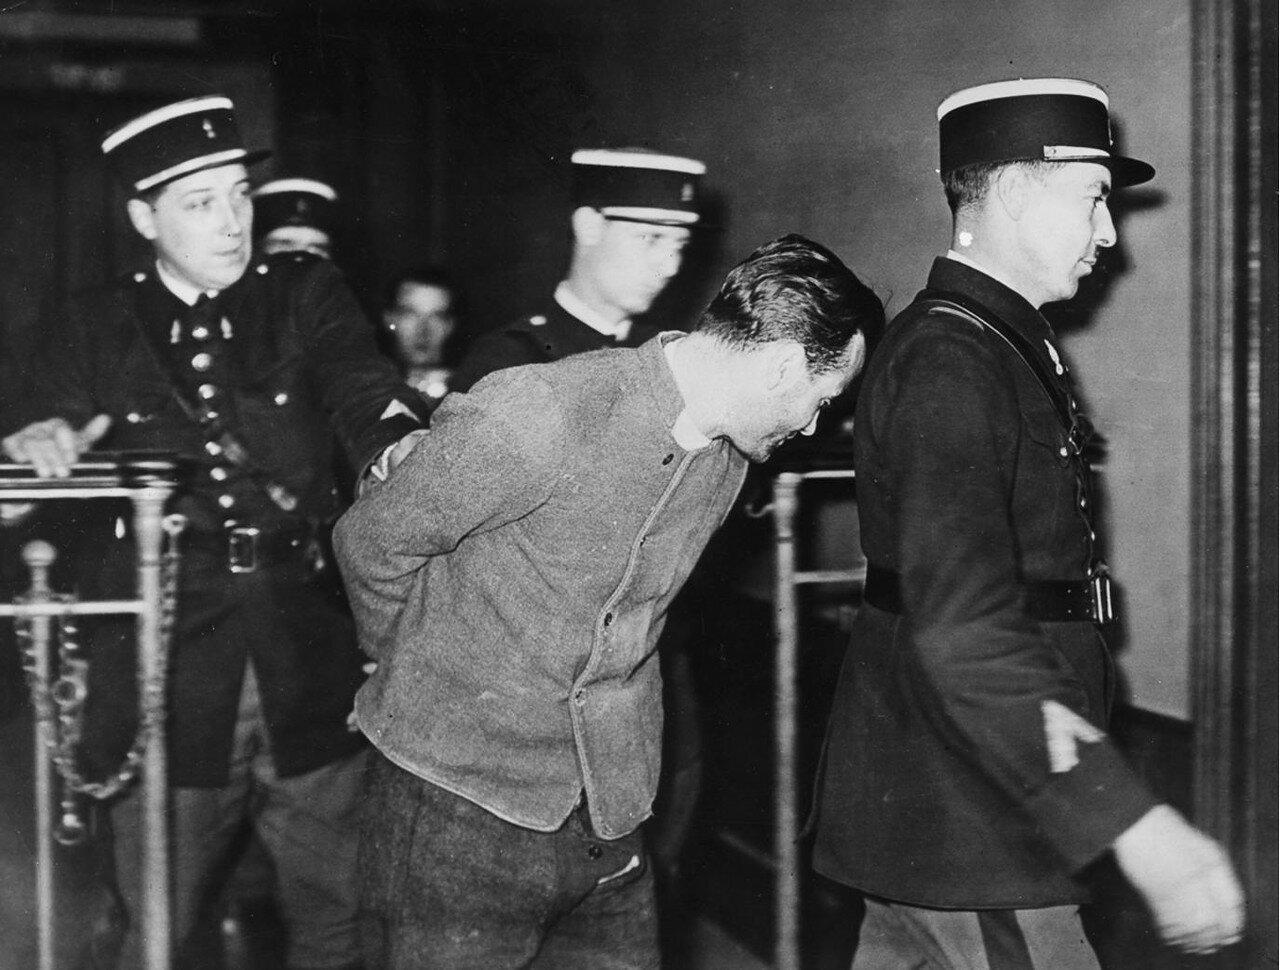 16. Вейдмана уводят в наручниках после его захвата полицией